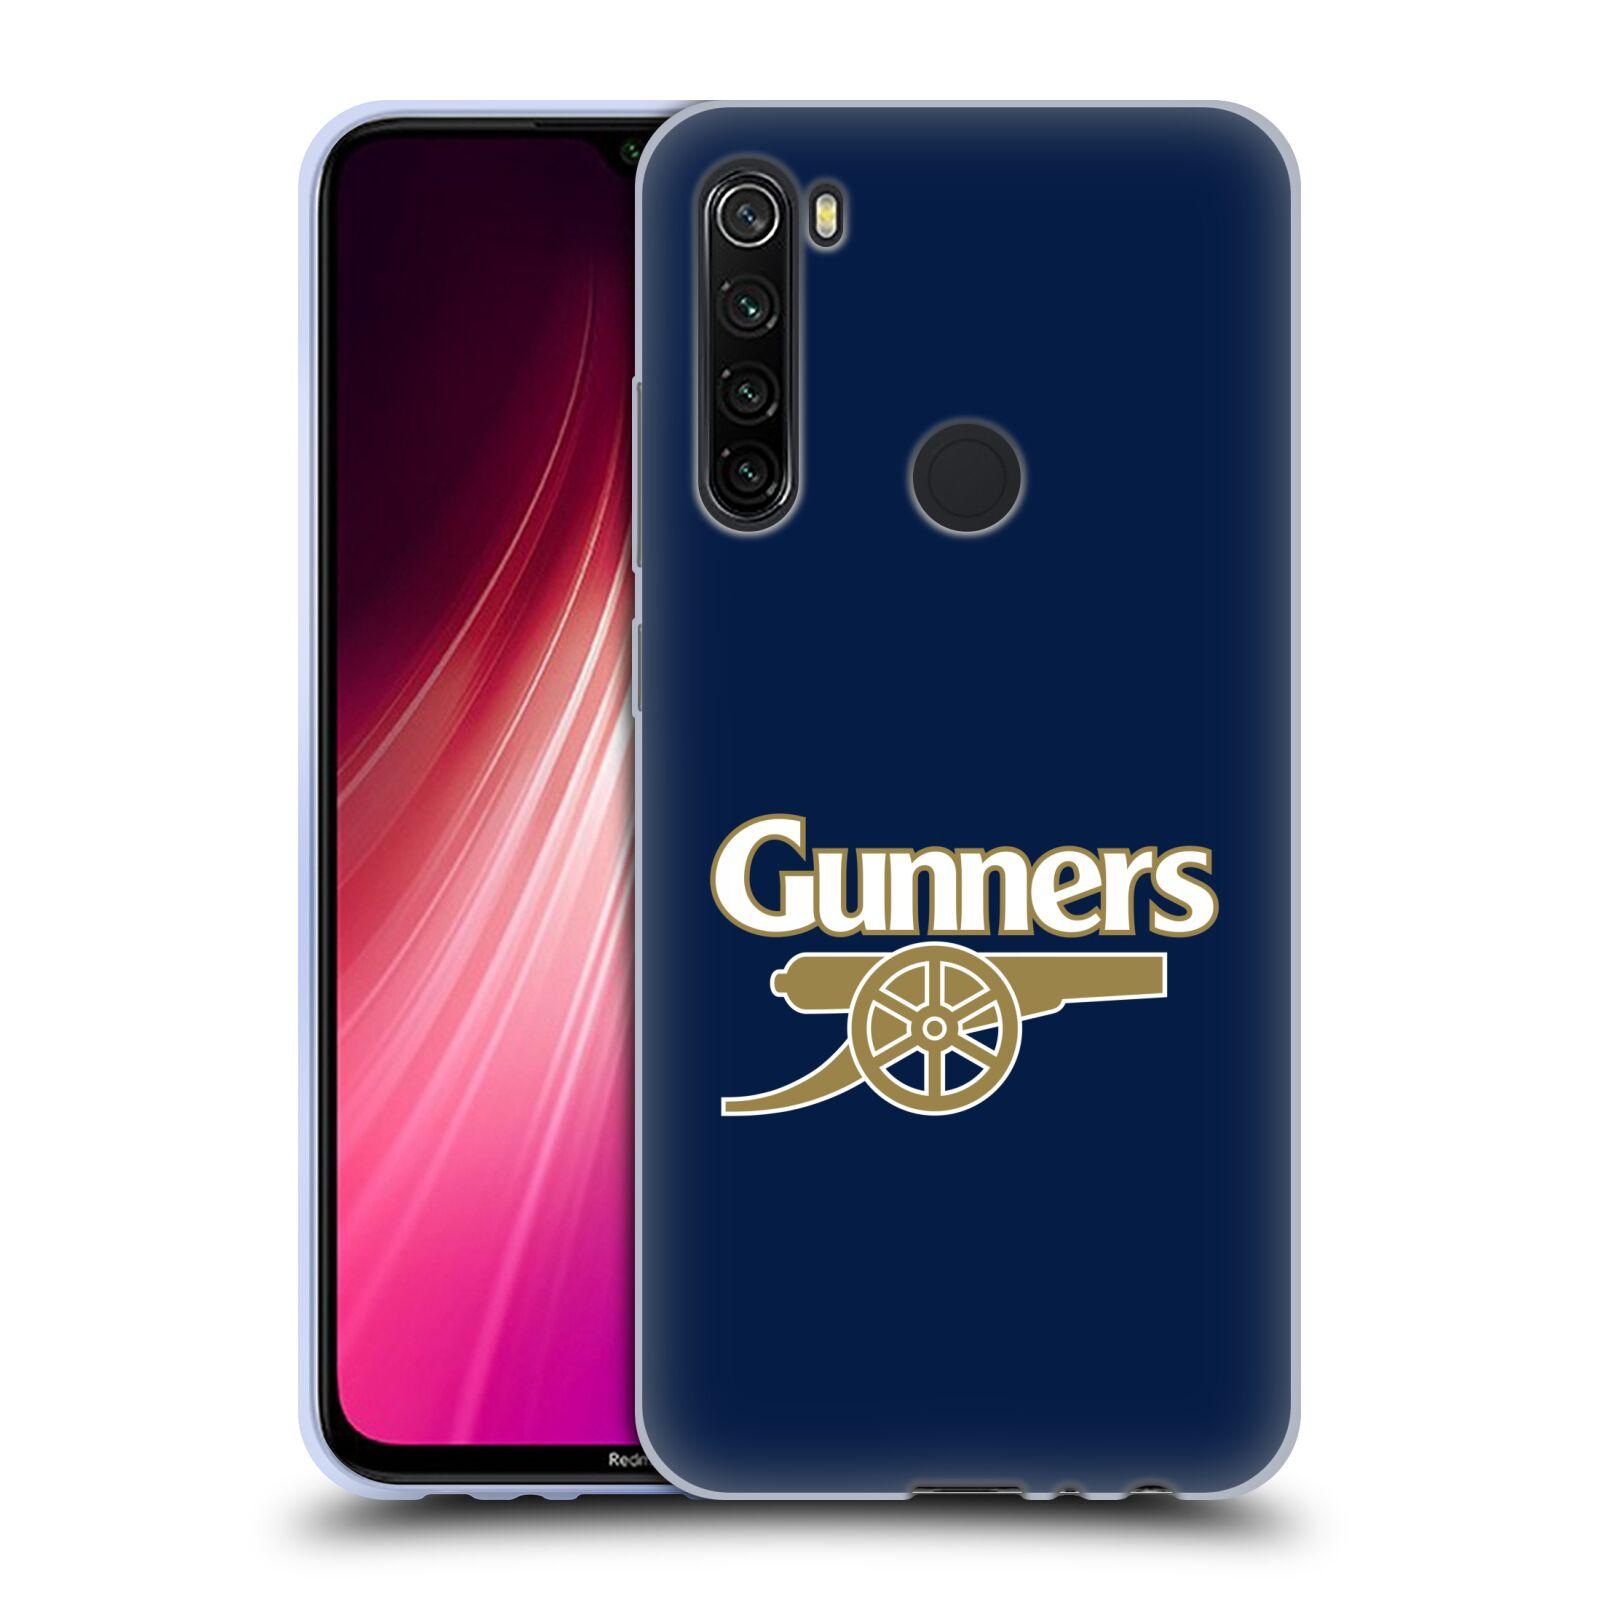 Silikonové pouzdro na mobil Xiaomi Redmi Note 8T - Head Case - Arsenal FC - Gunners